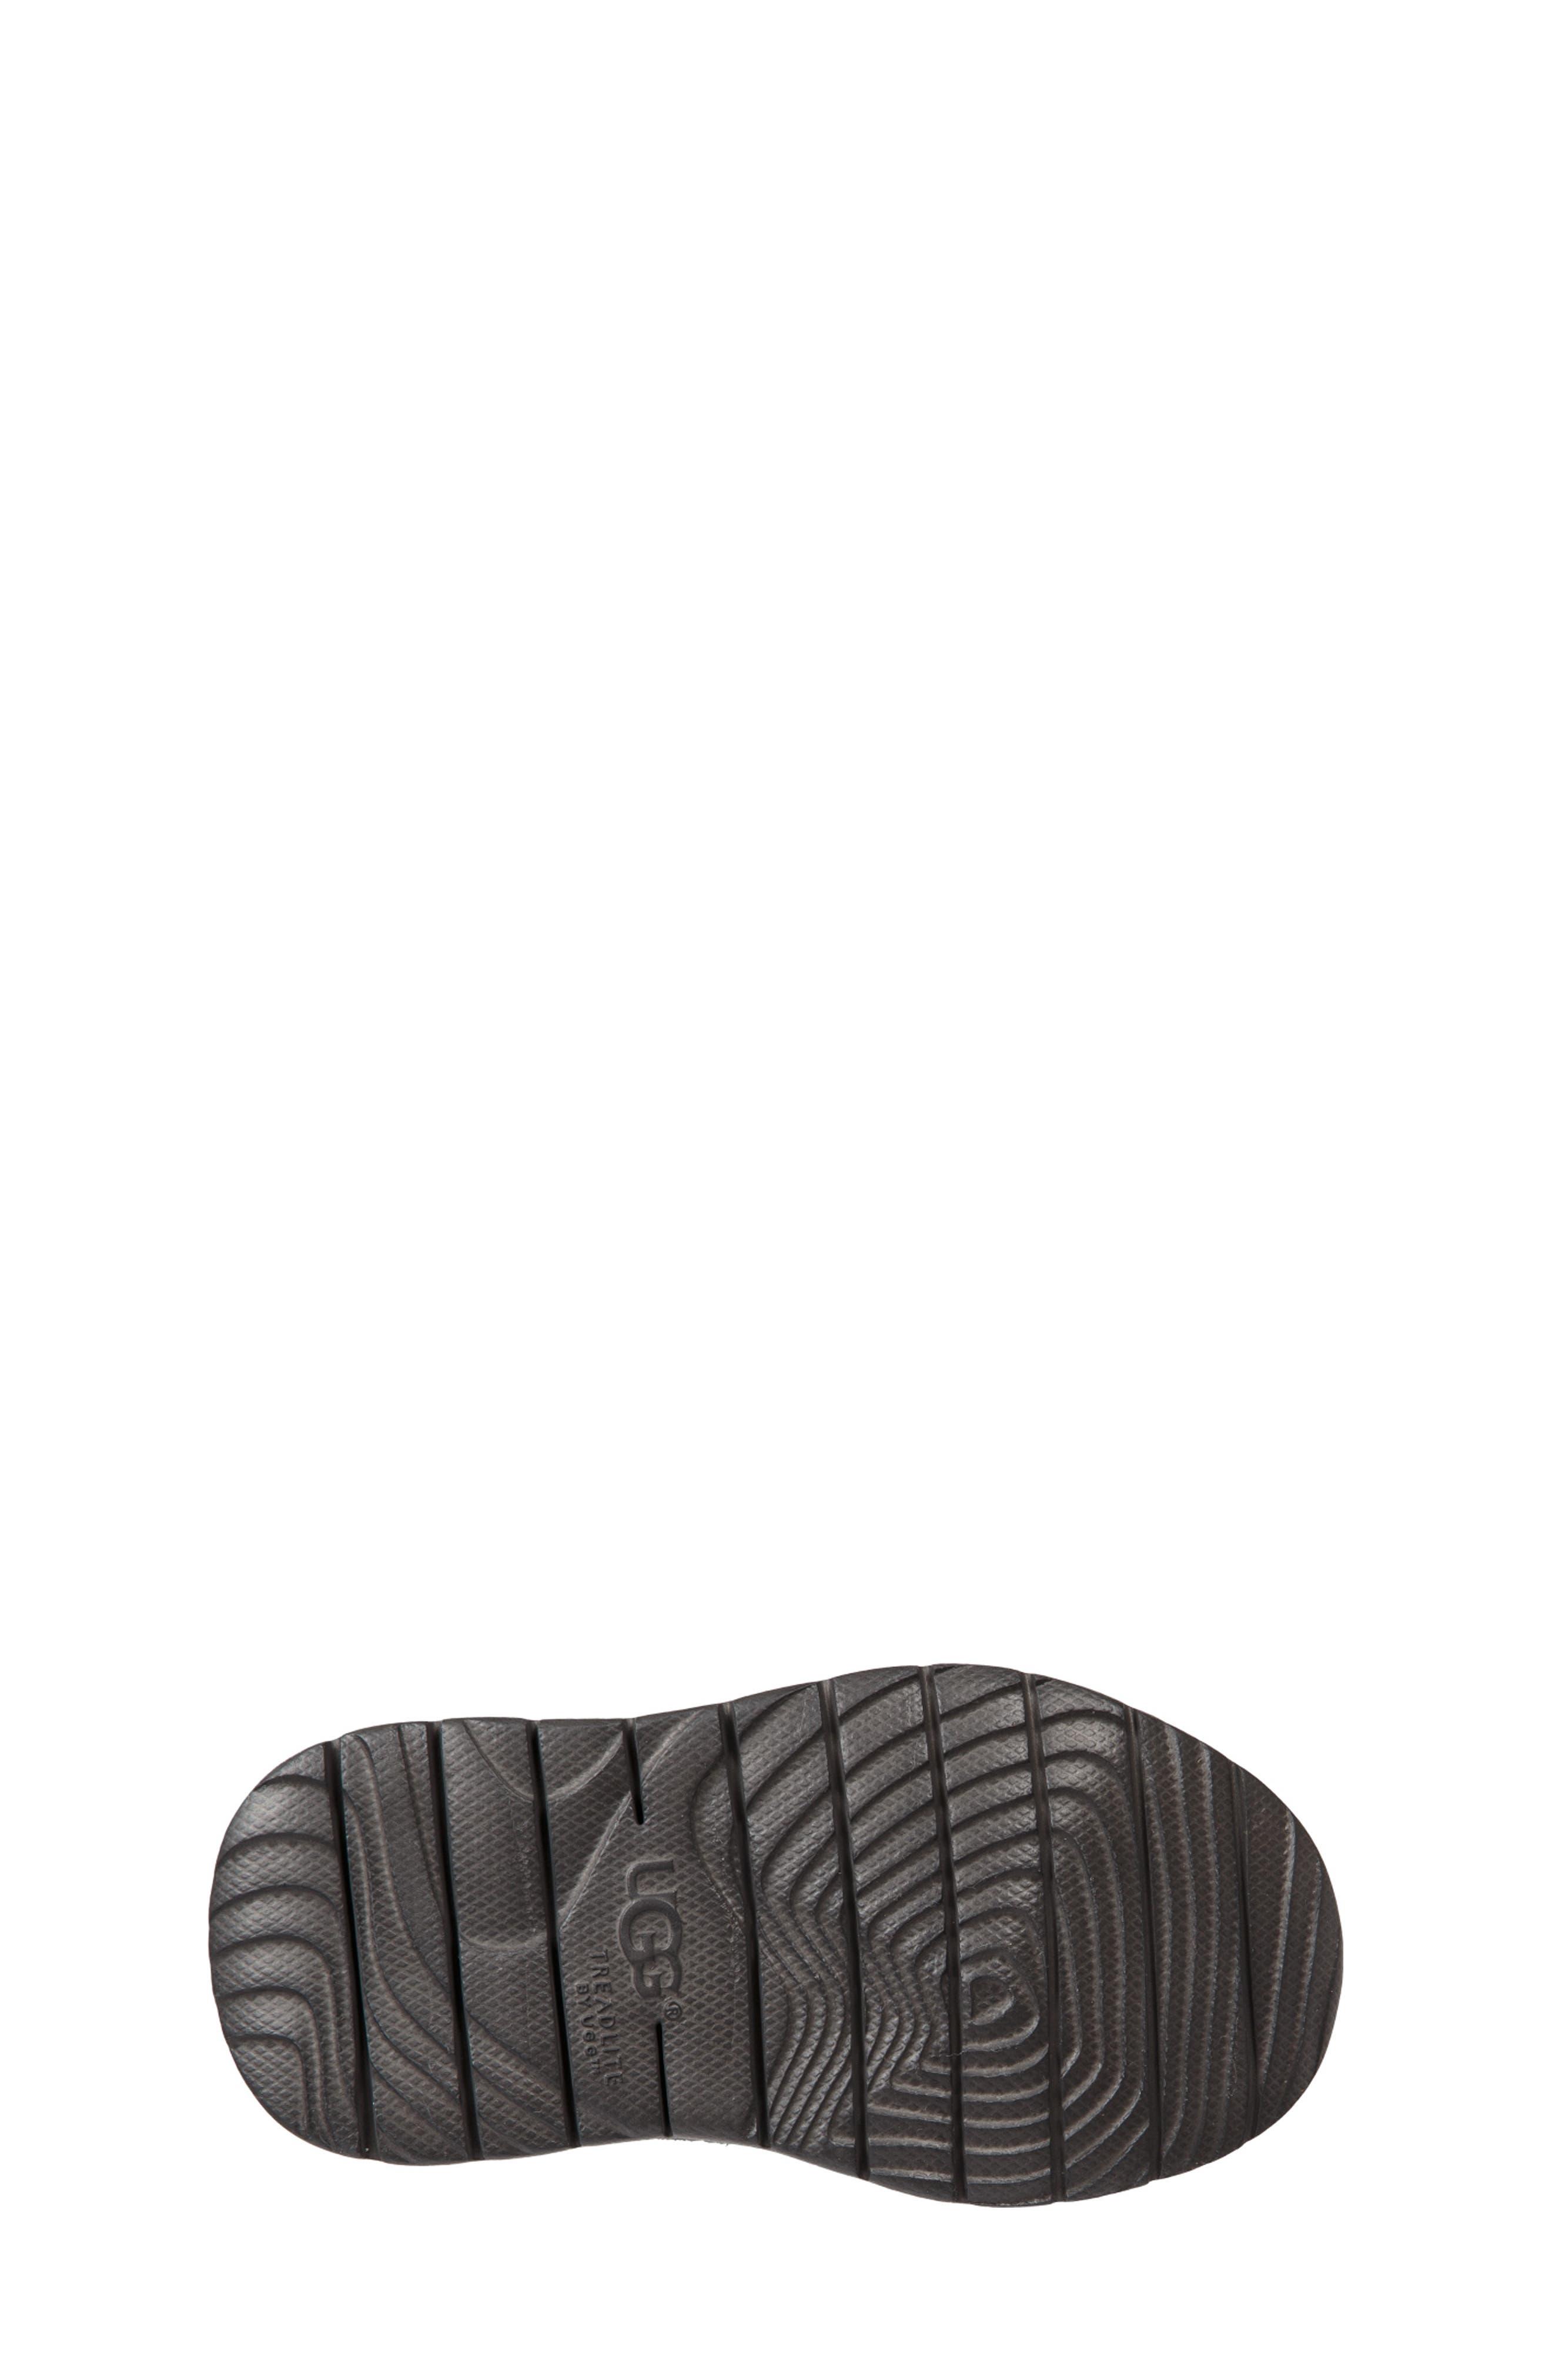 Canoe Chukka Sneaker,                             Alternate thumbnail 5, color,                             GREY / BLACK